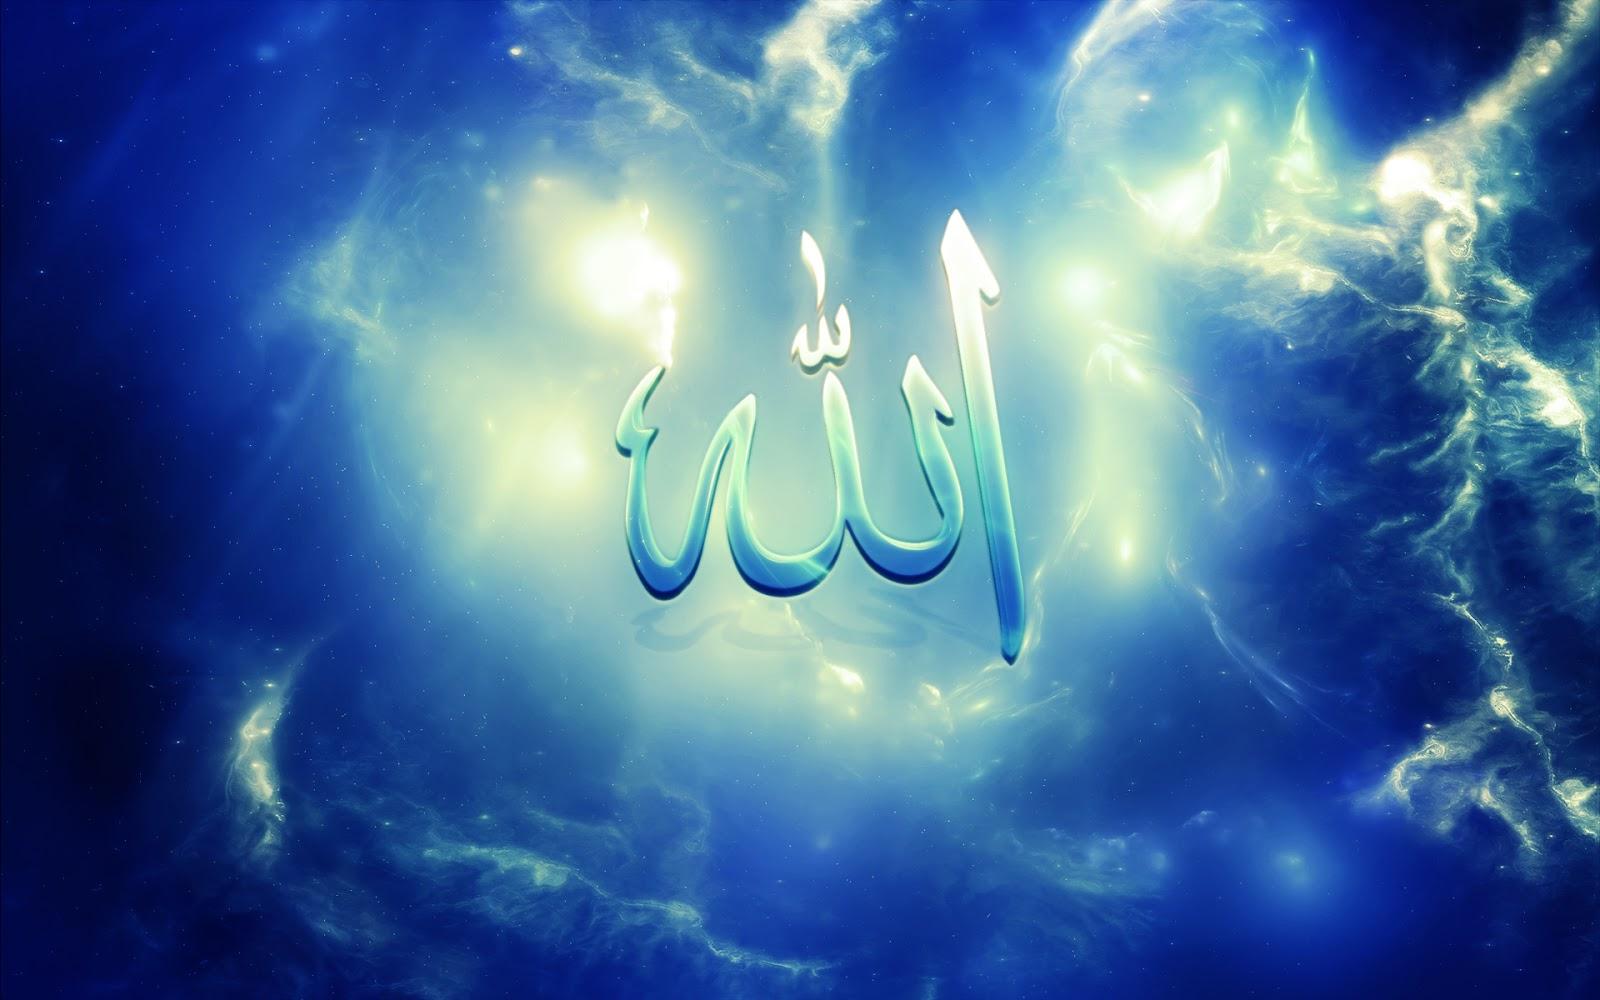 46 Allah Muhammad Wallpaper Hd On Wallpapersafari